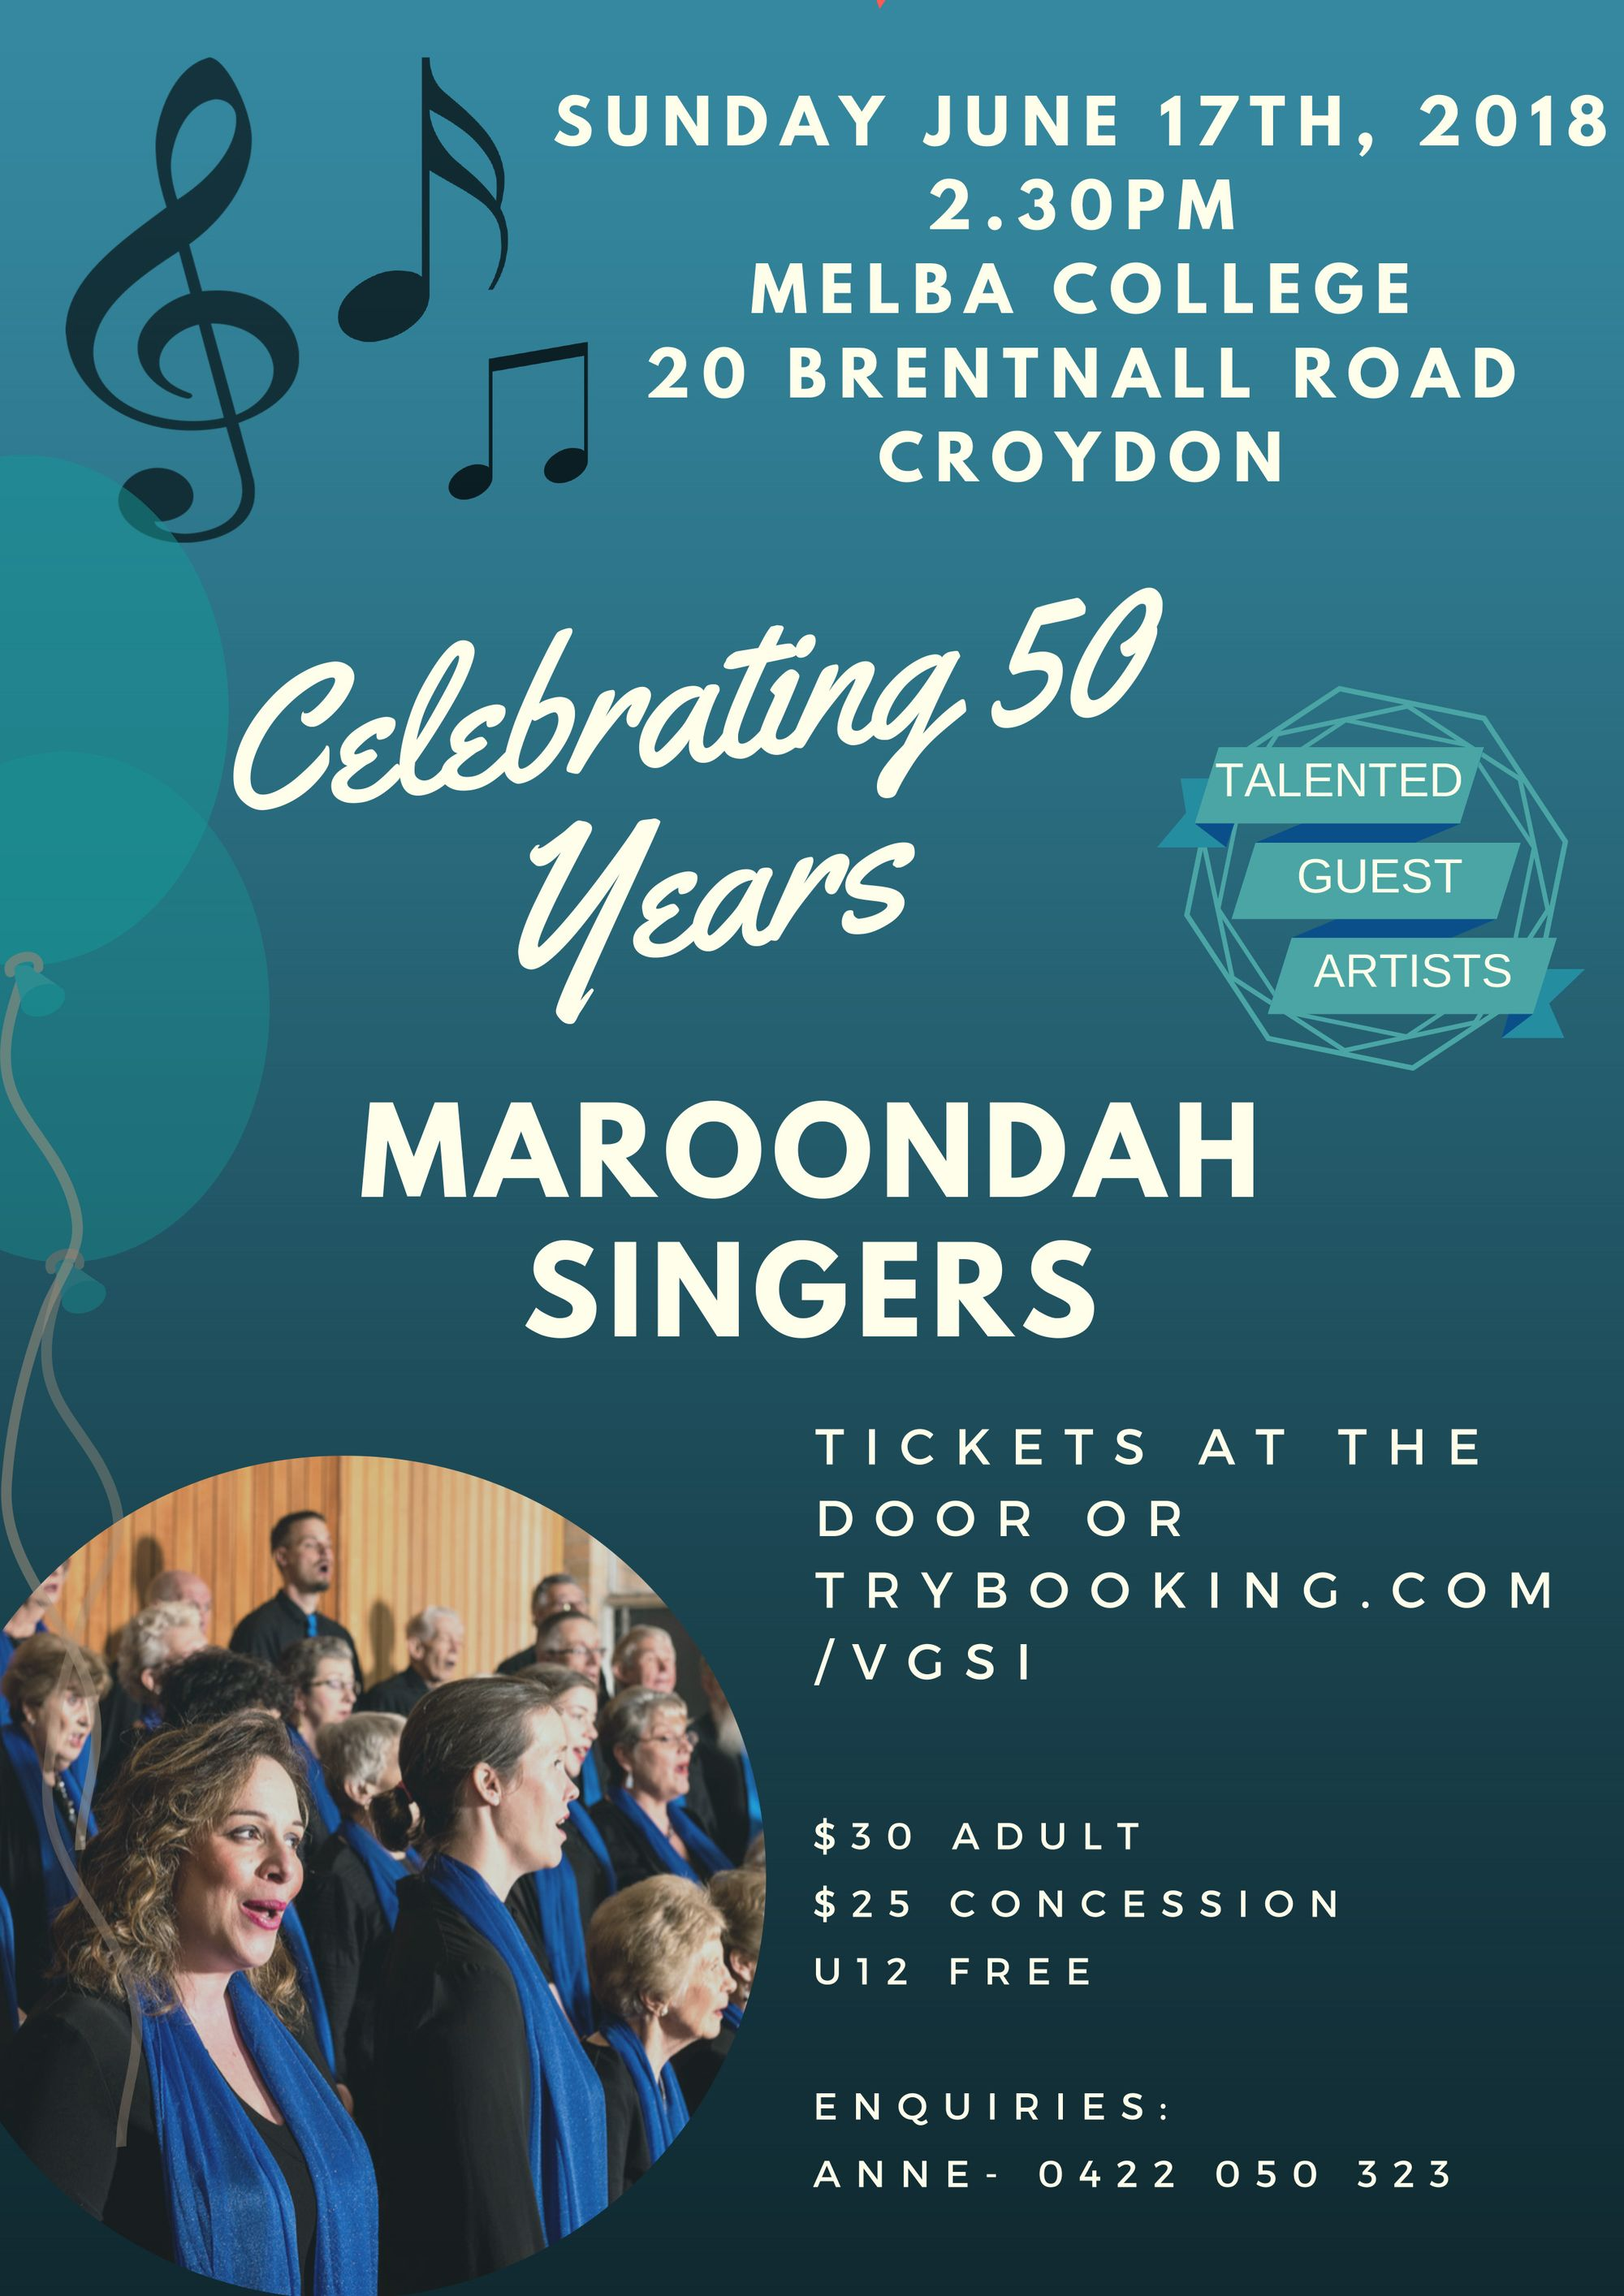 Maroondah Singers